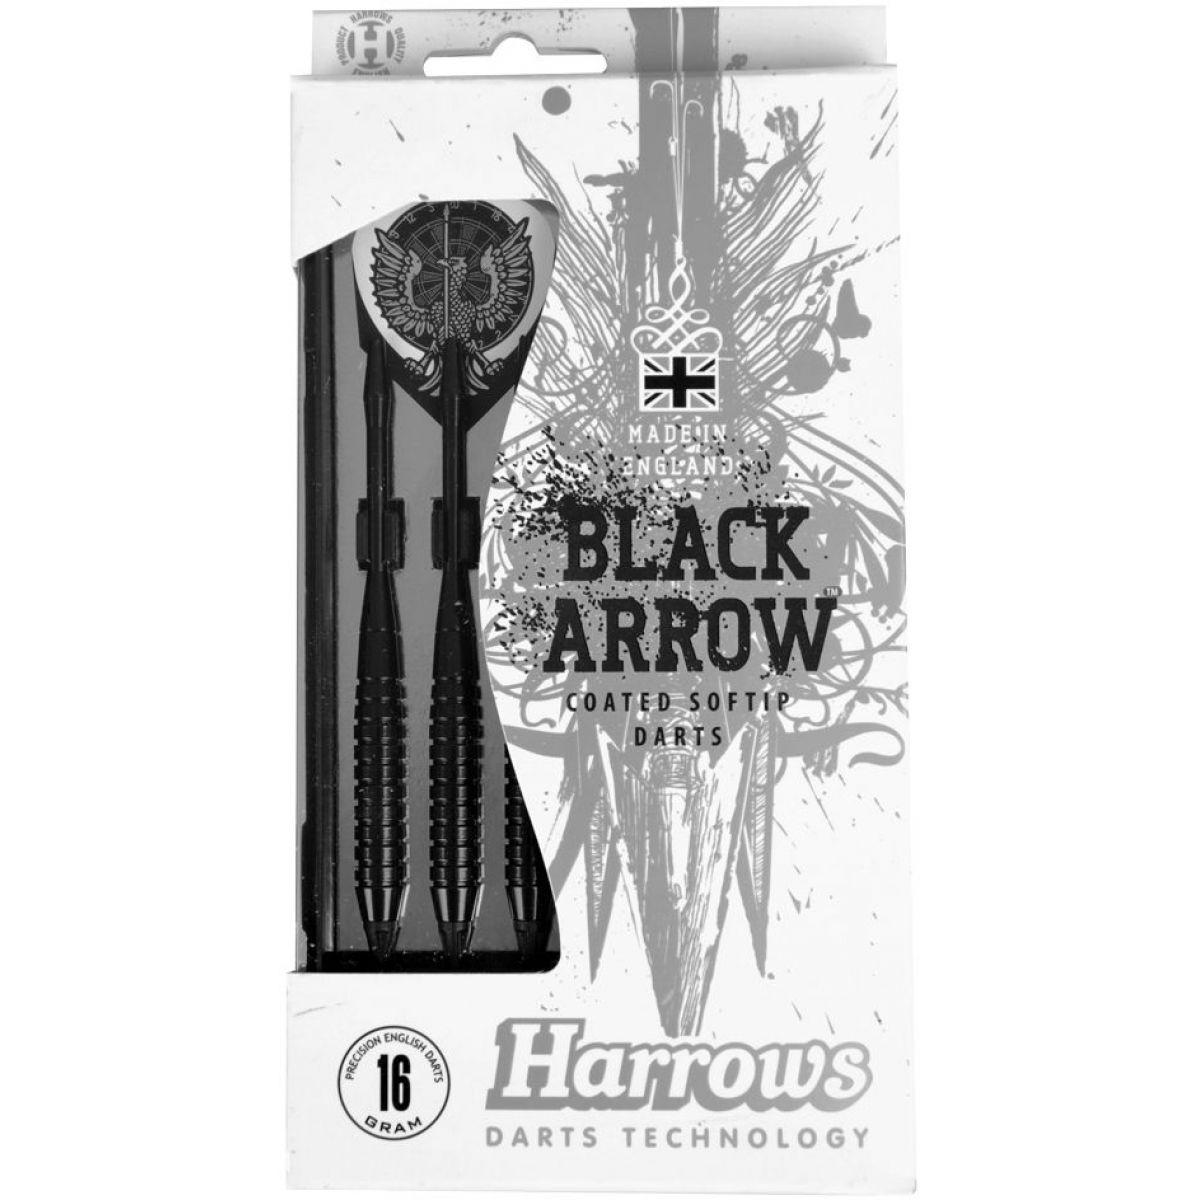 Harrows Black Arrow soft 16g K2